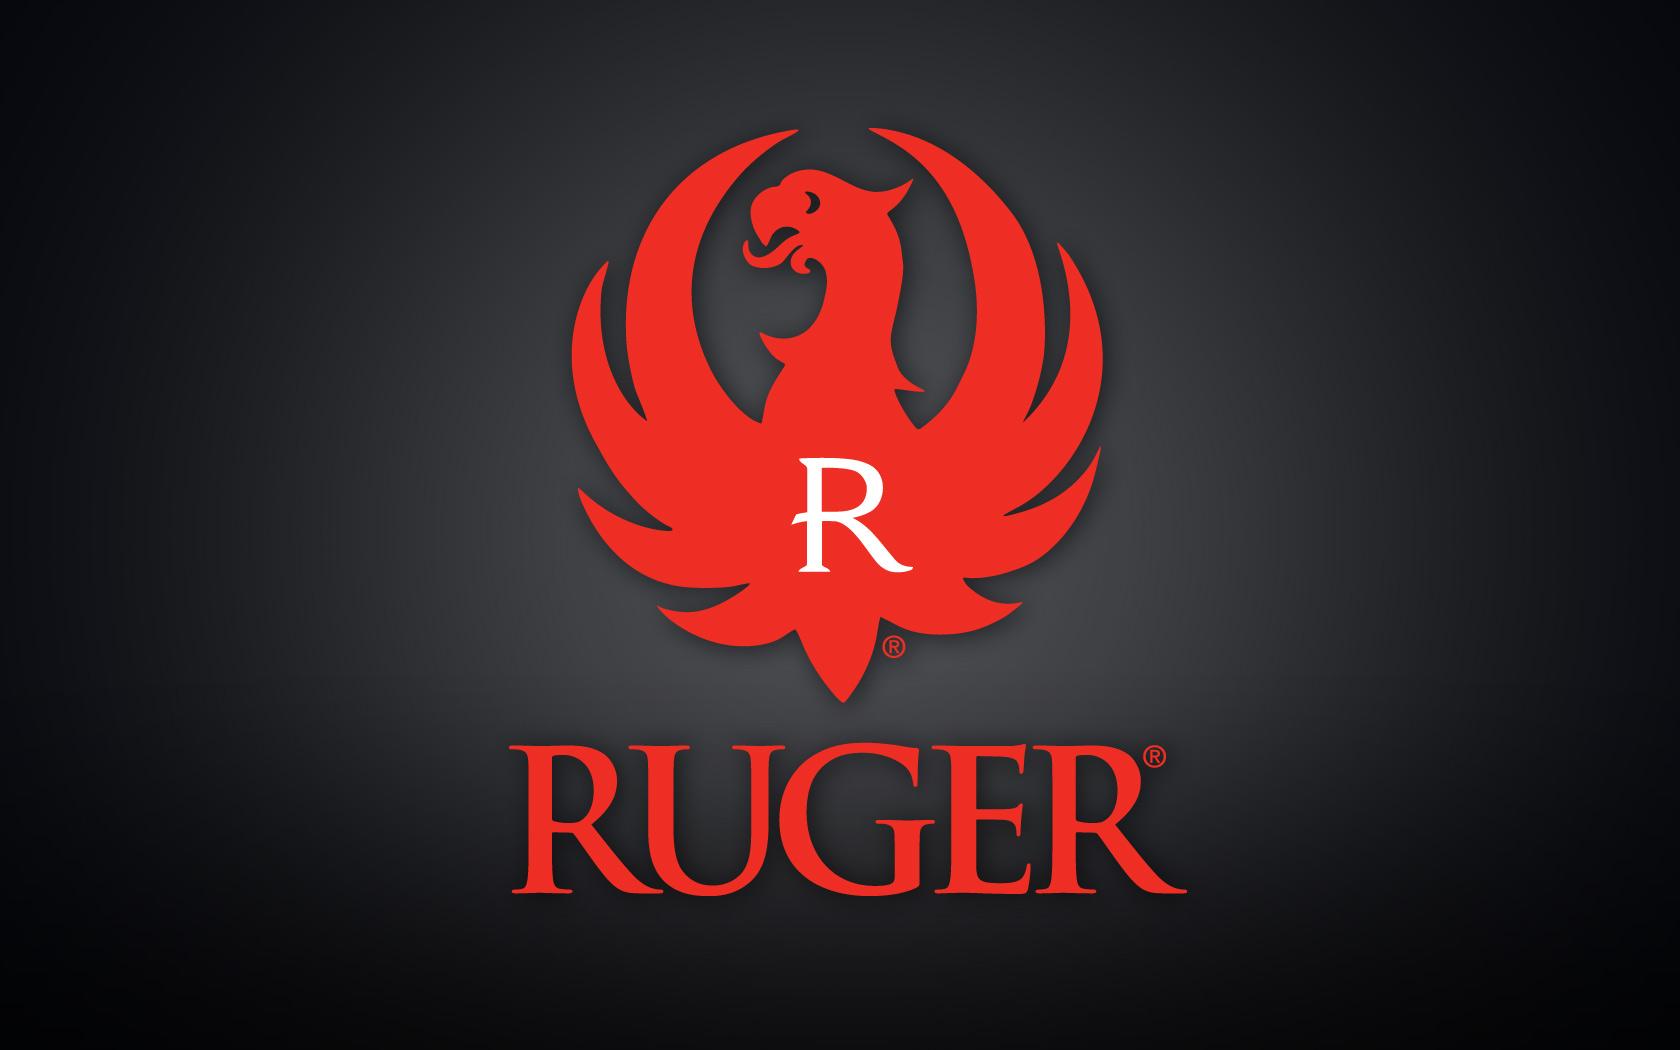 Red Phoenix Logo Desktop Backgrounds Pinterest 1680x1050